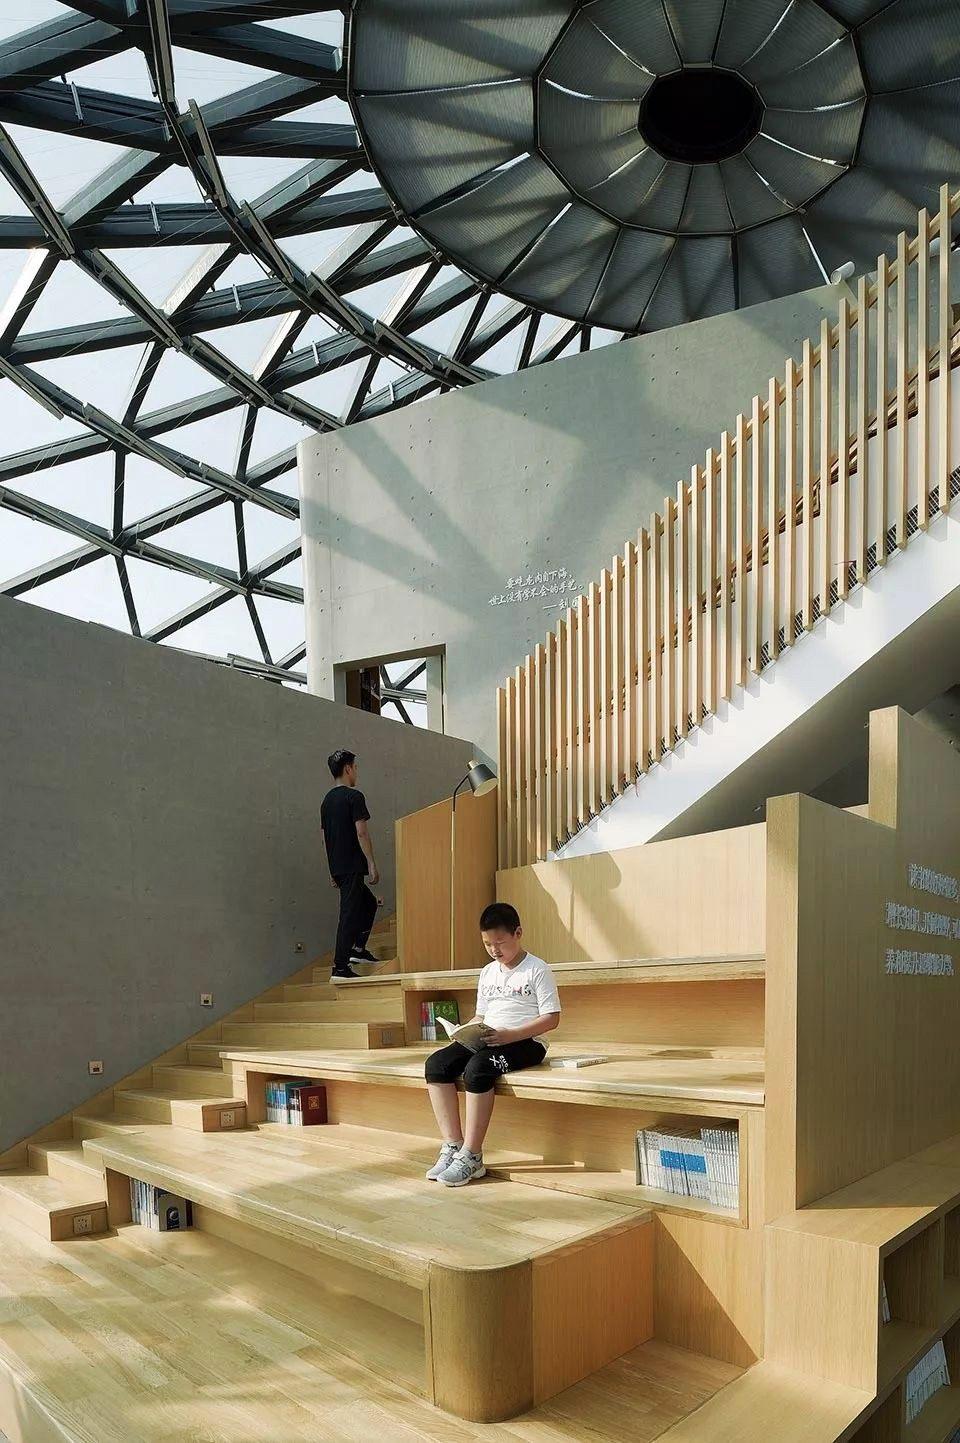 Metrics建筑事务所】890㎡ | 玻璃穹顶下的盒子 靖江书吧 | 实..